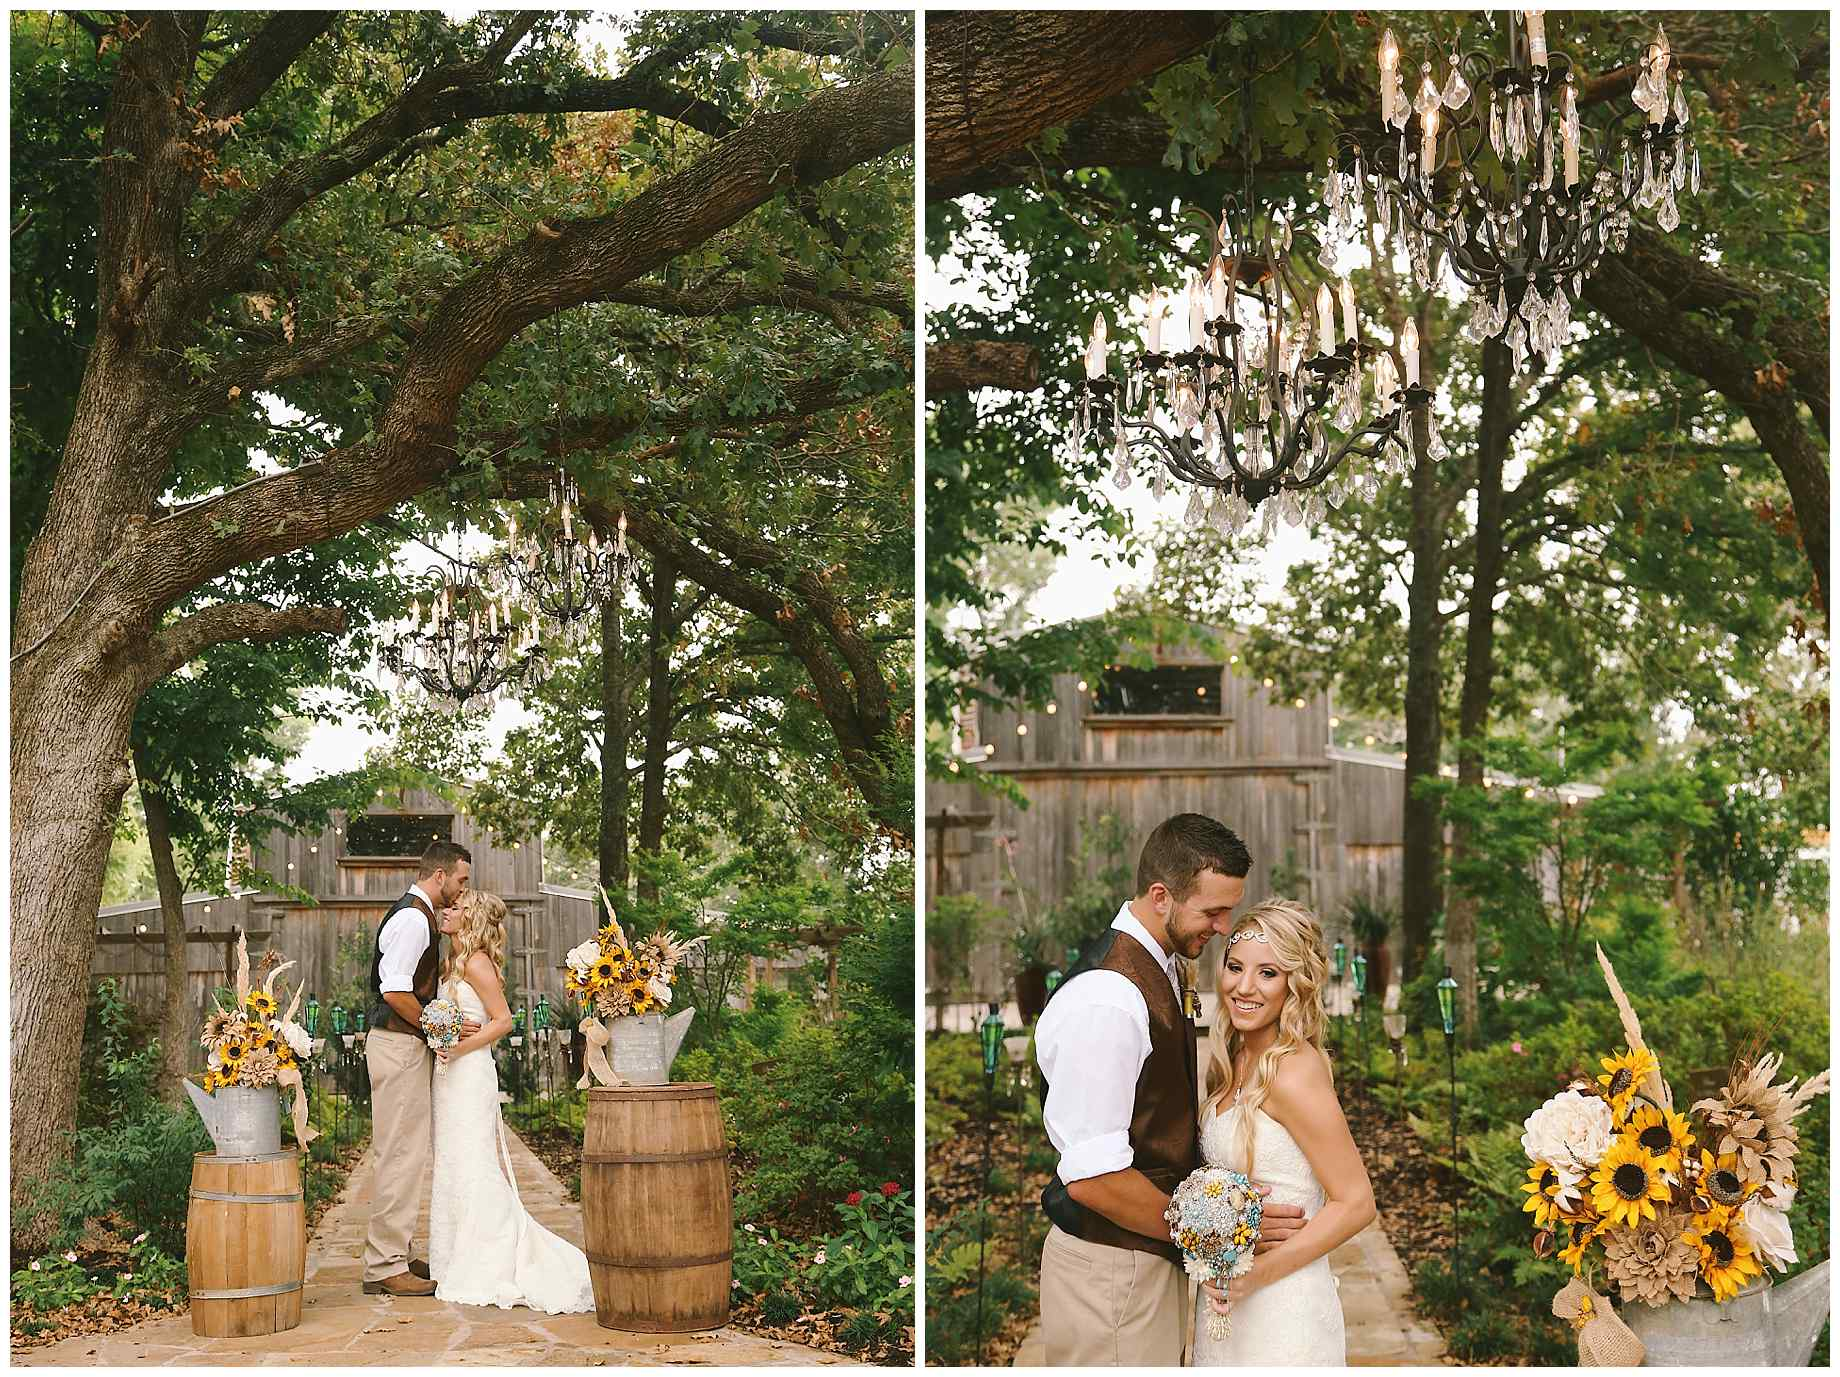 stone-oak-ranch-outdoor-wedding-011